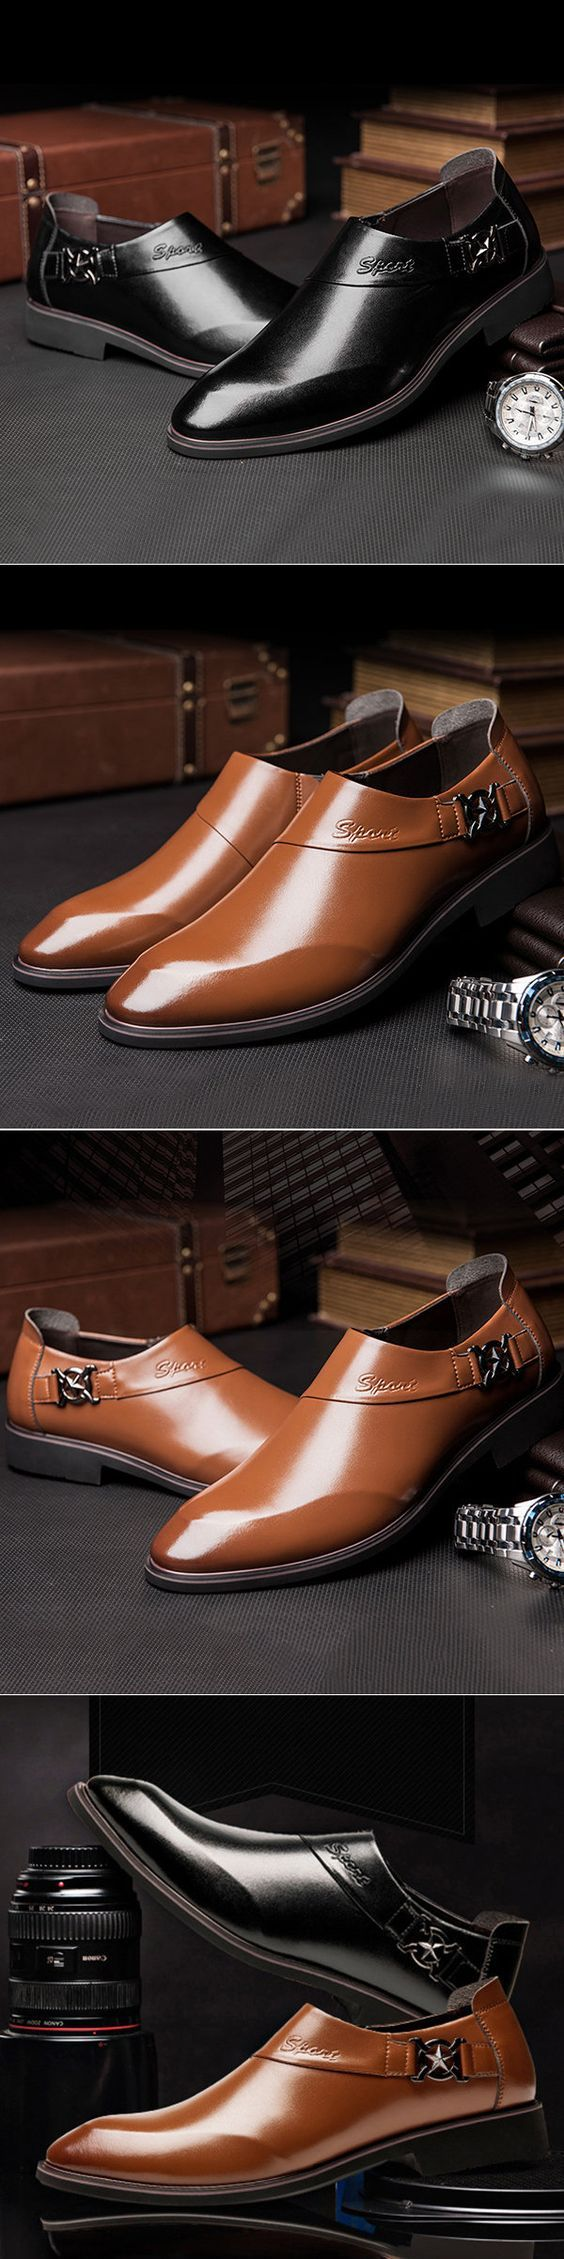 Us men microfiber leather pointed toe slip on formal dress